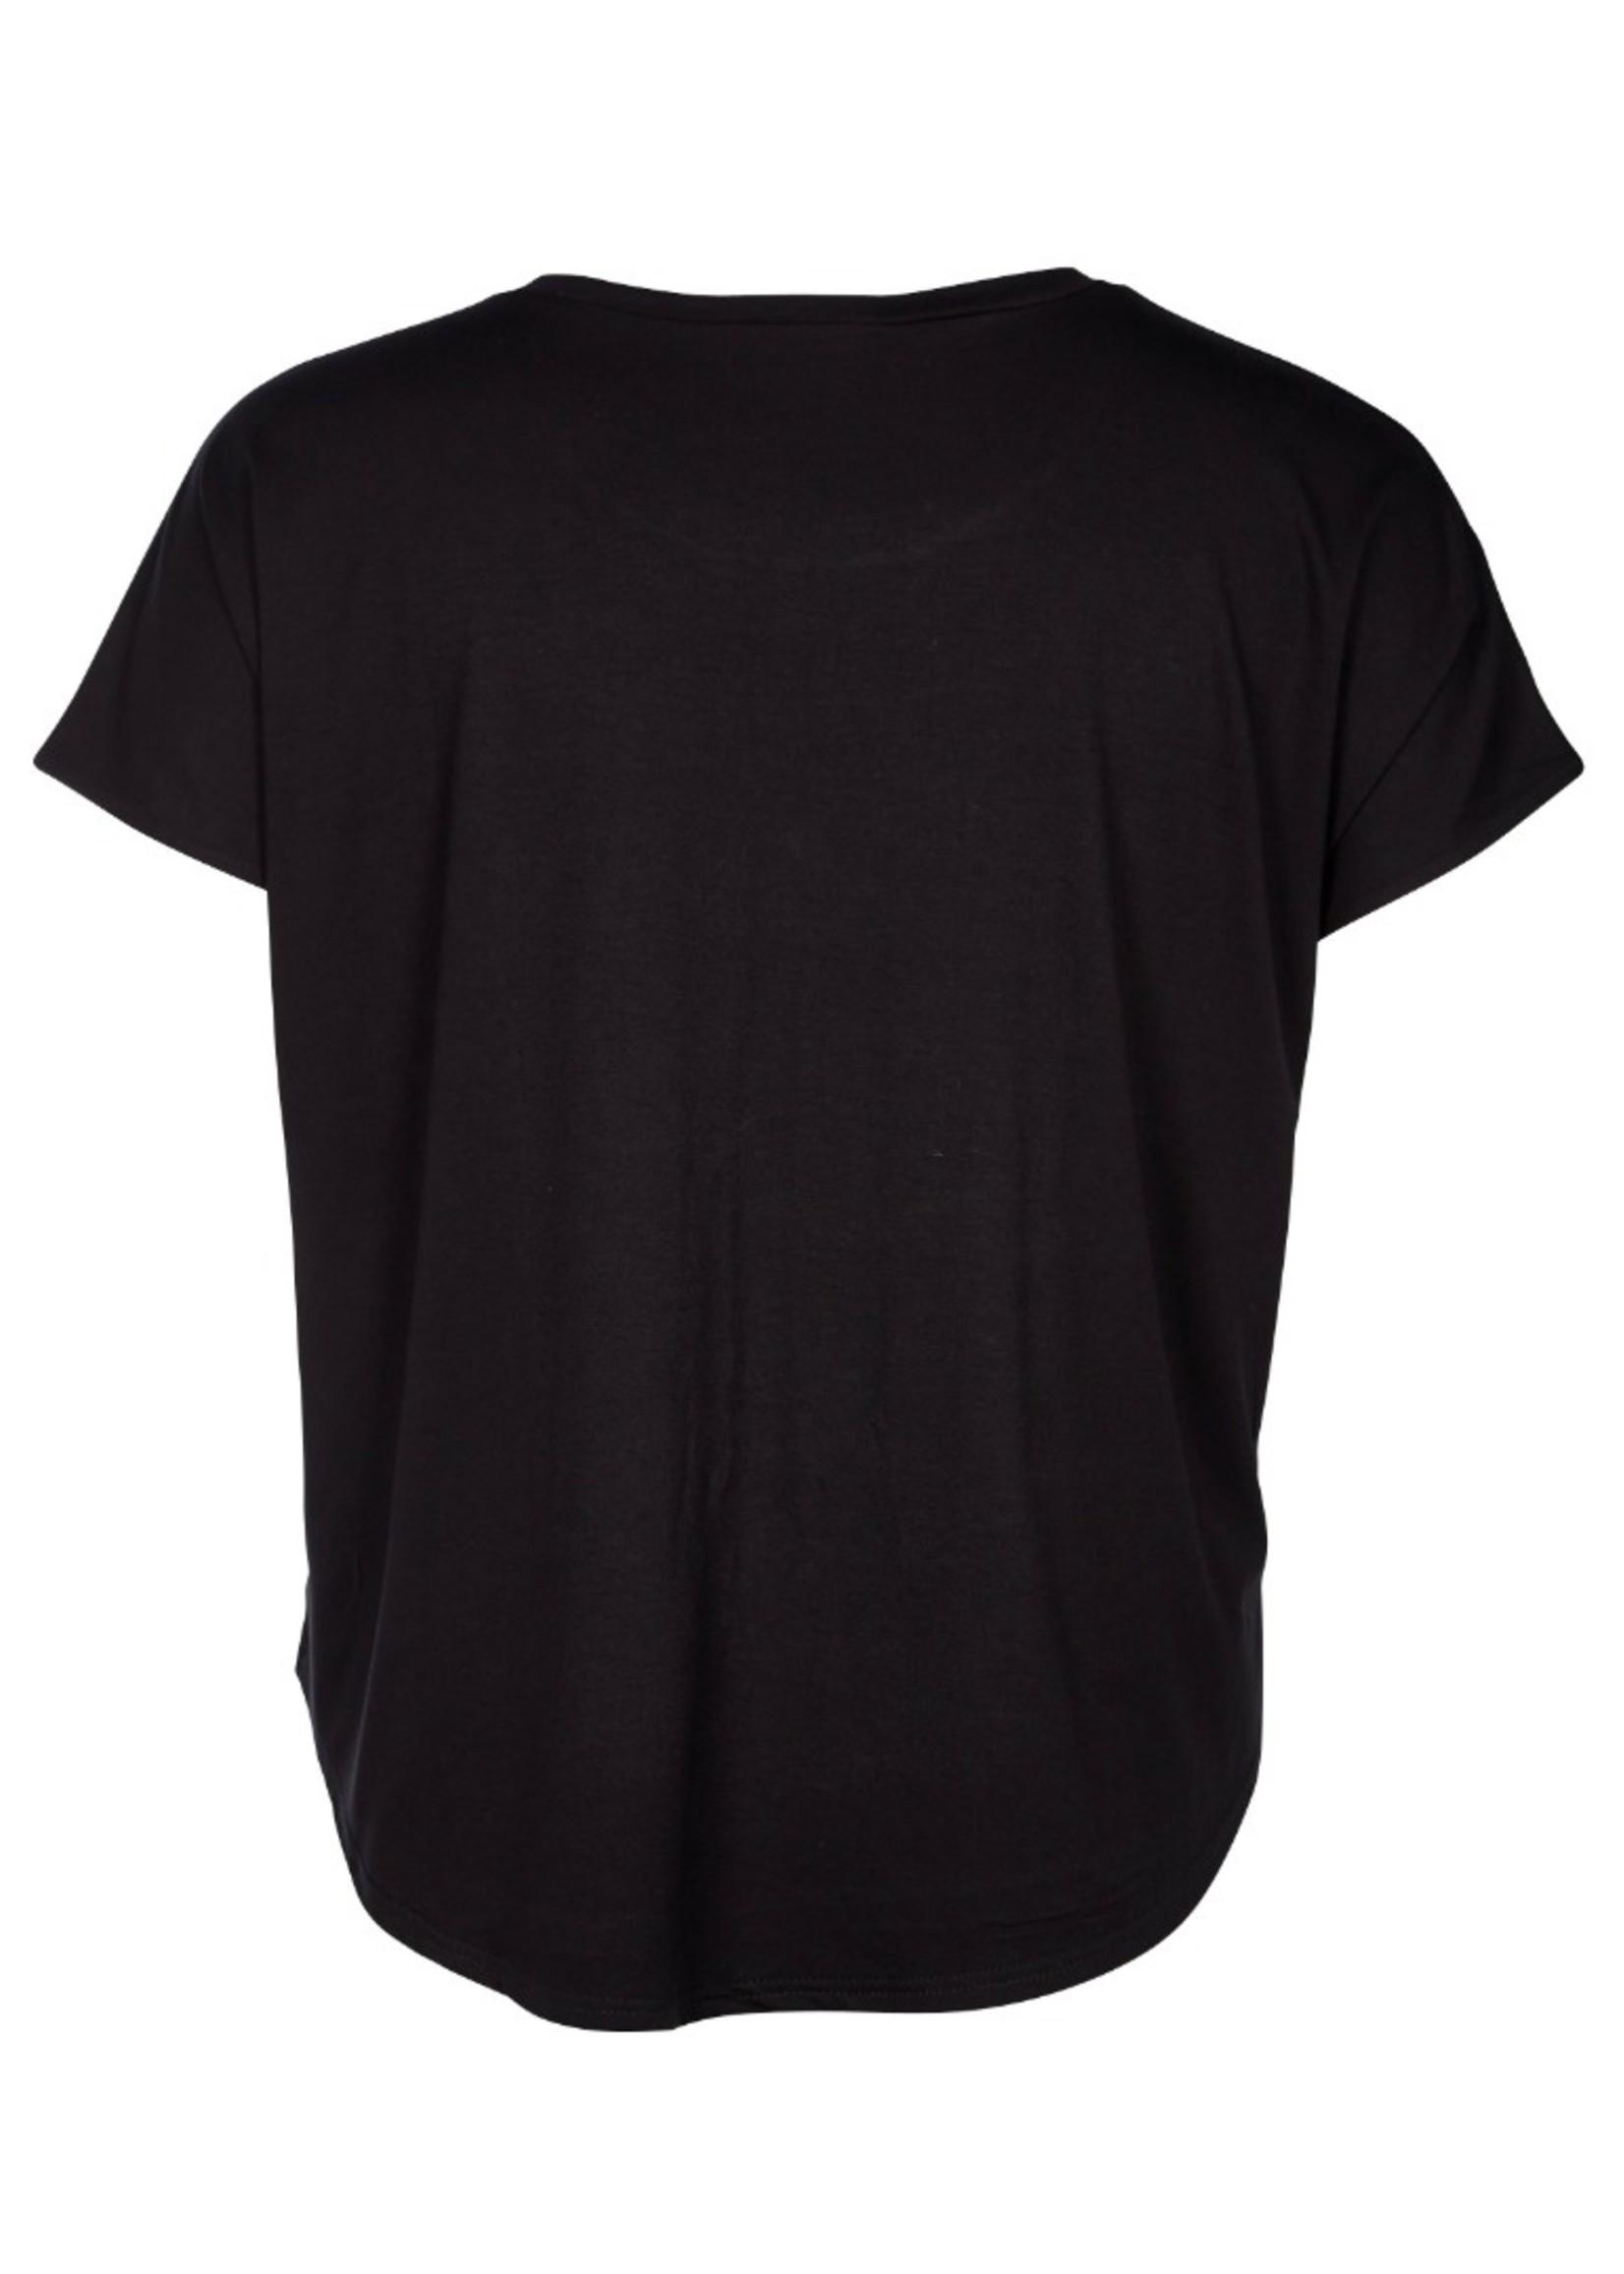 Zoey Zoey Makenna T-shirt